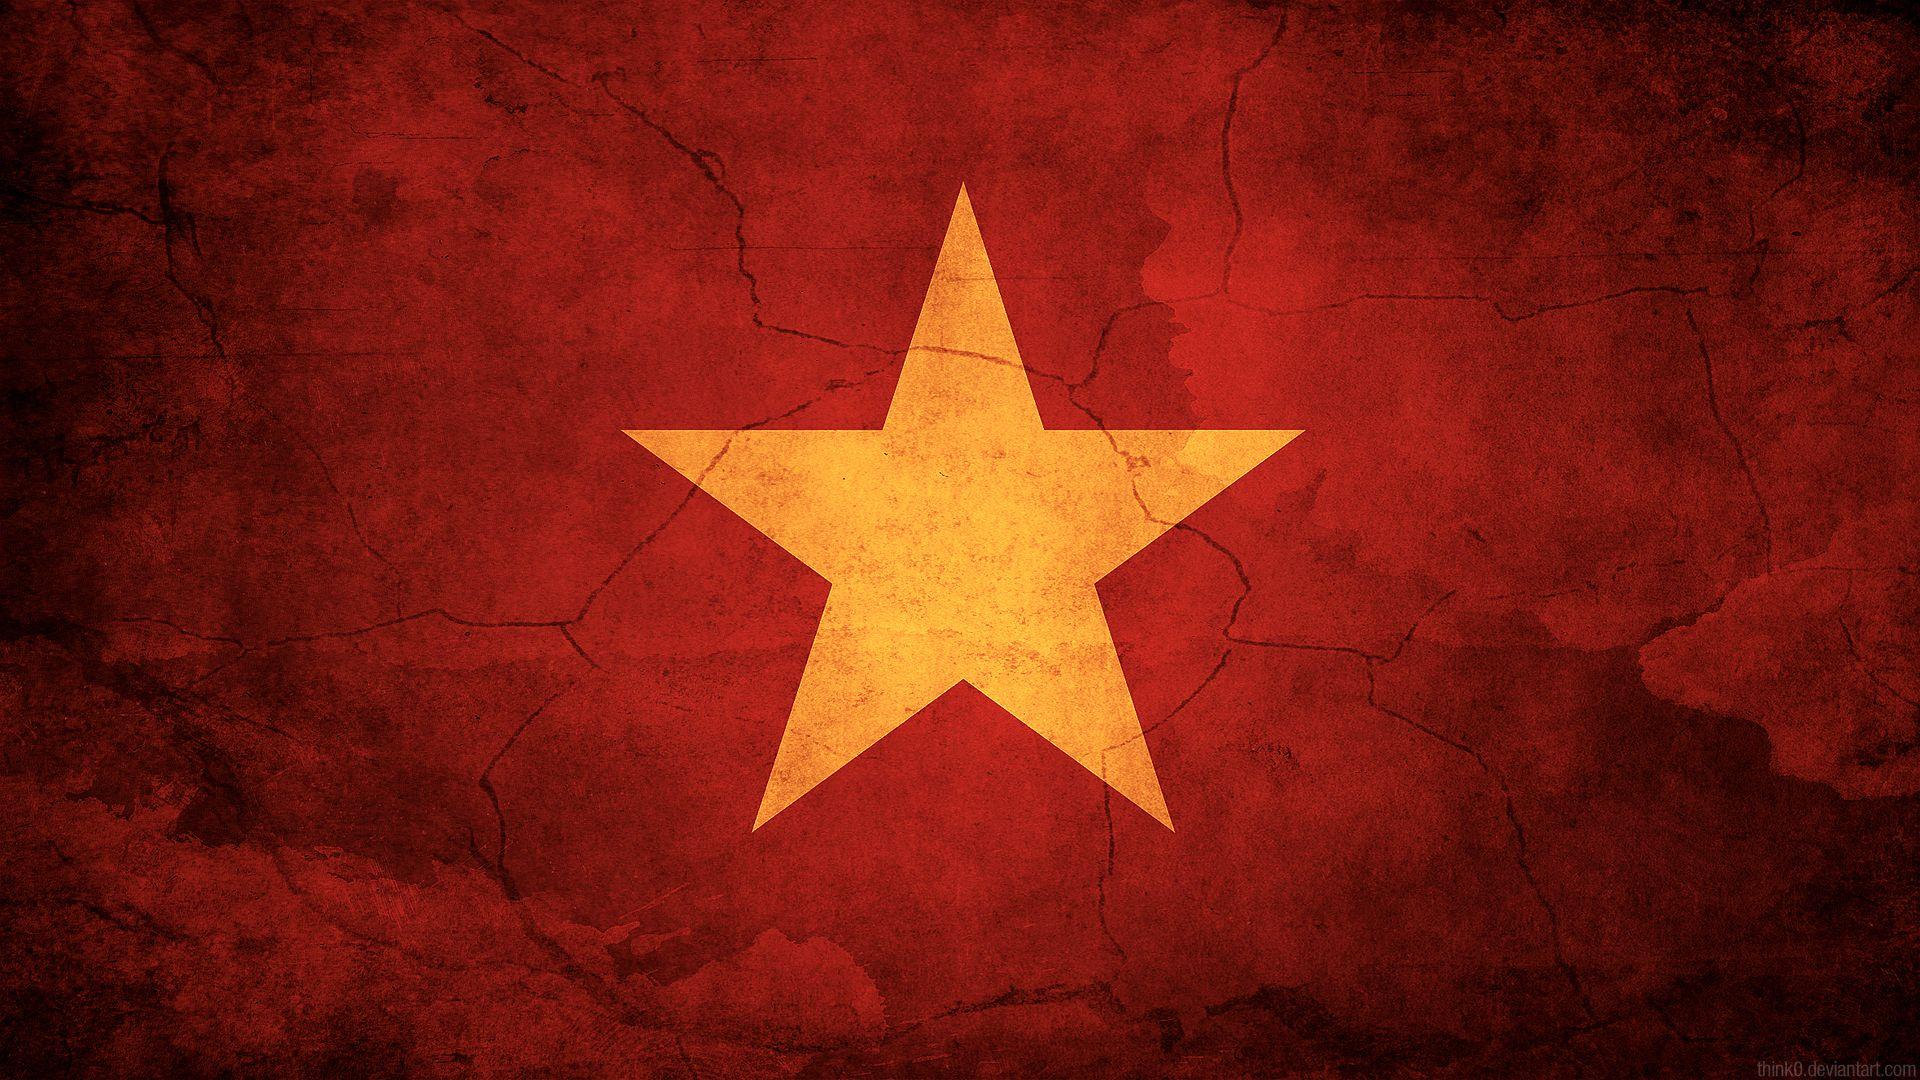 Vietnam Flag by think0deviantartcom C hnh nh Vit nam 1920x1080